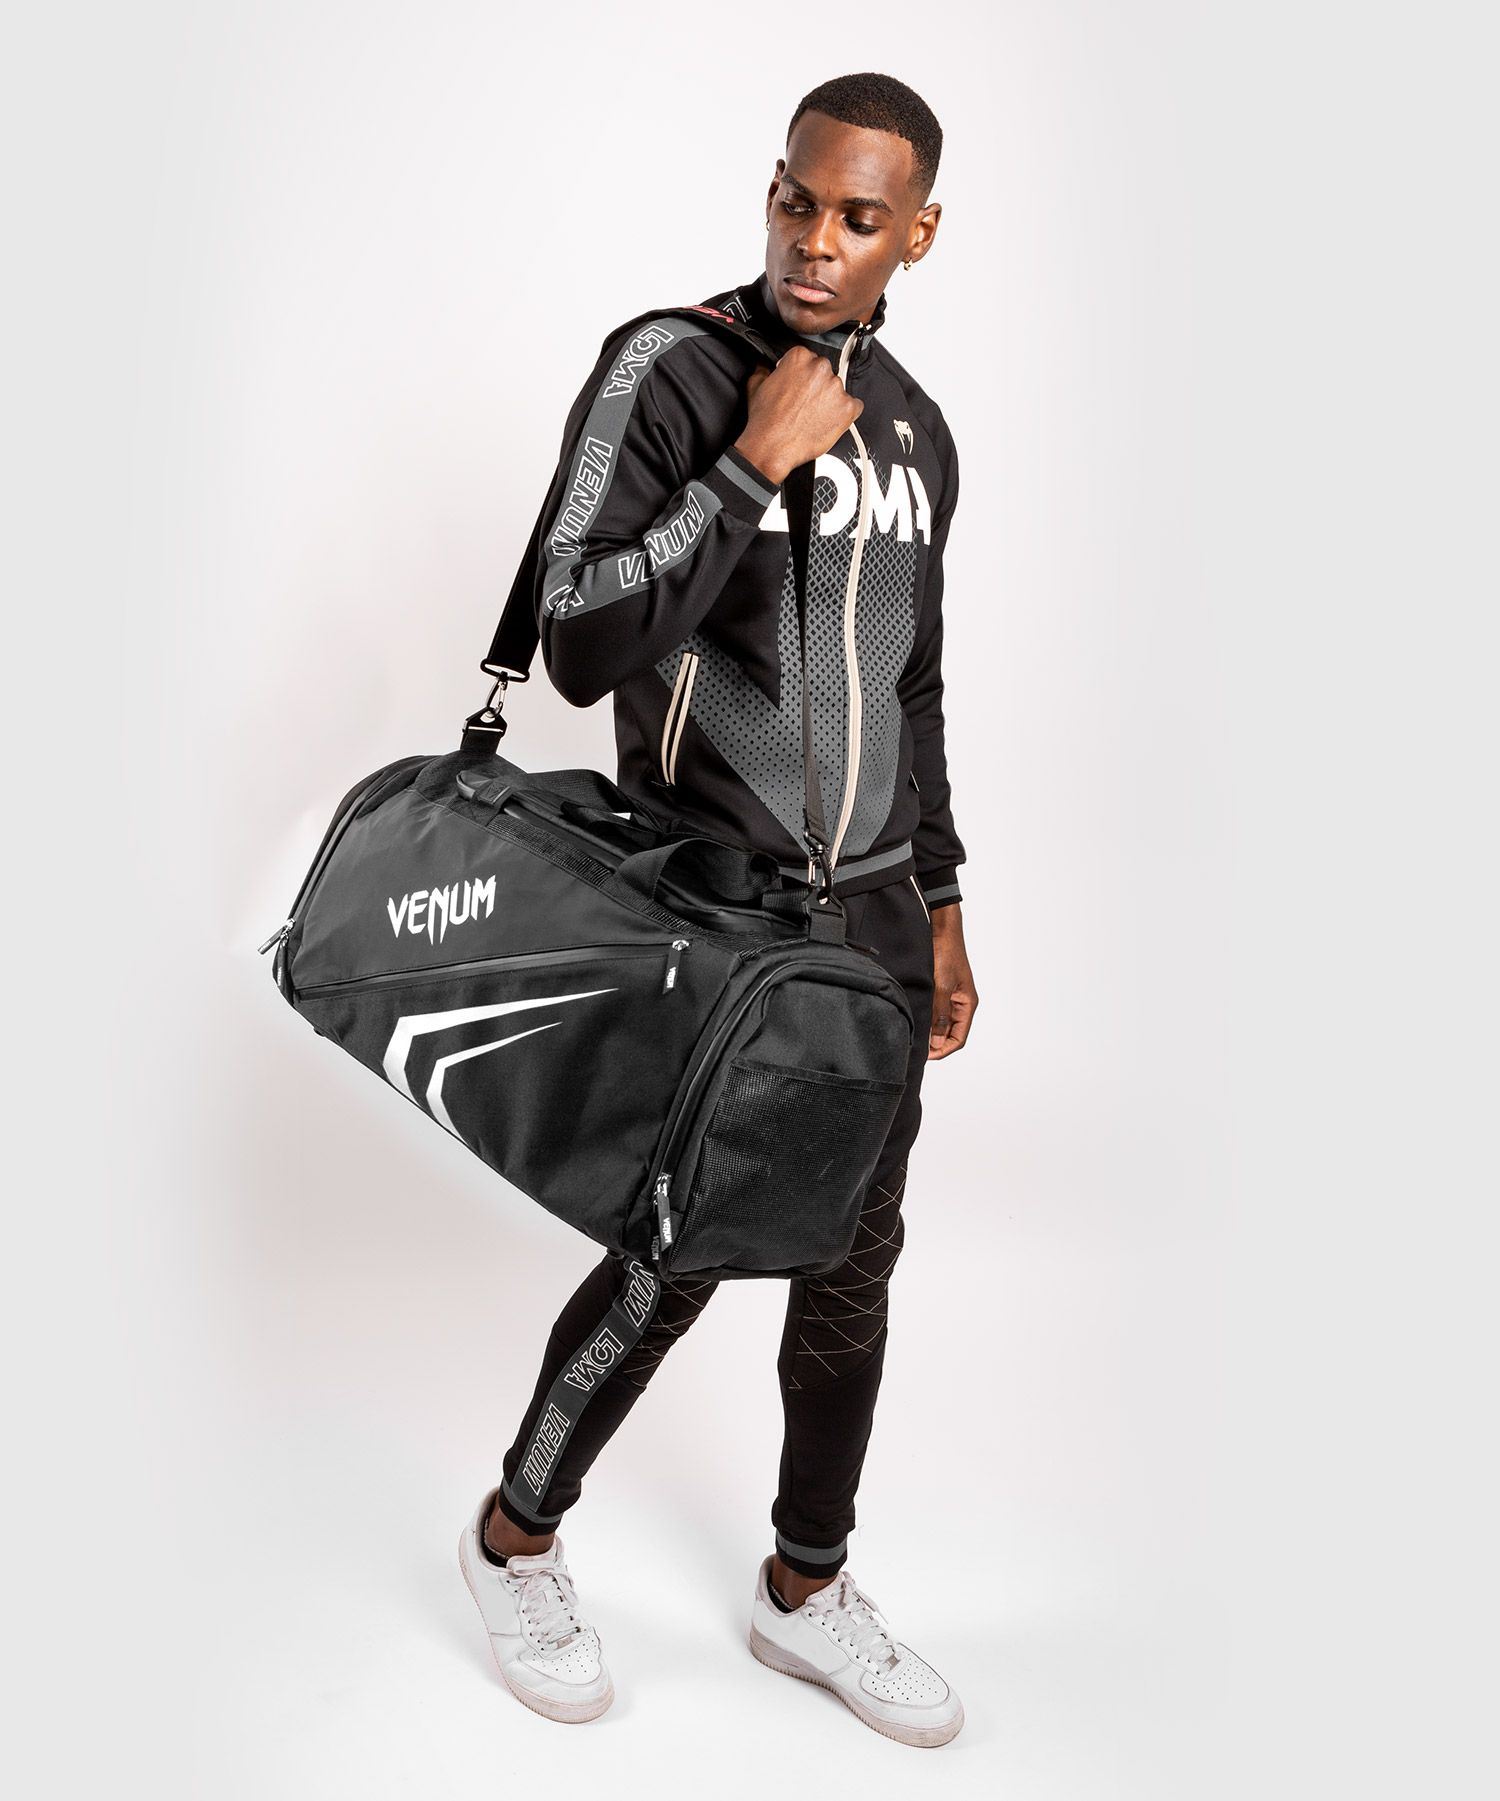 Venum Arrow Loma Firma Collezione Zipped Jacket - Nero / Bianco